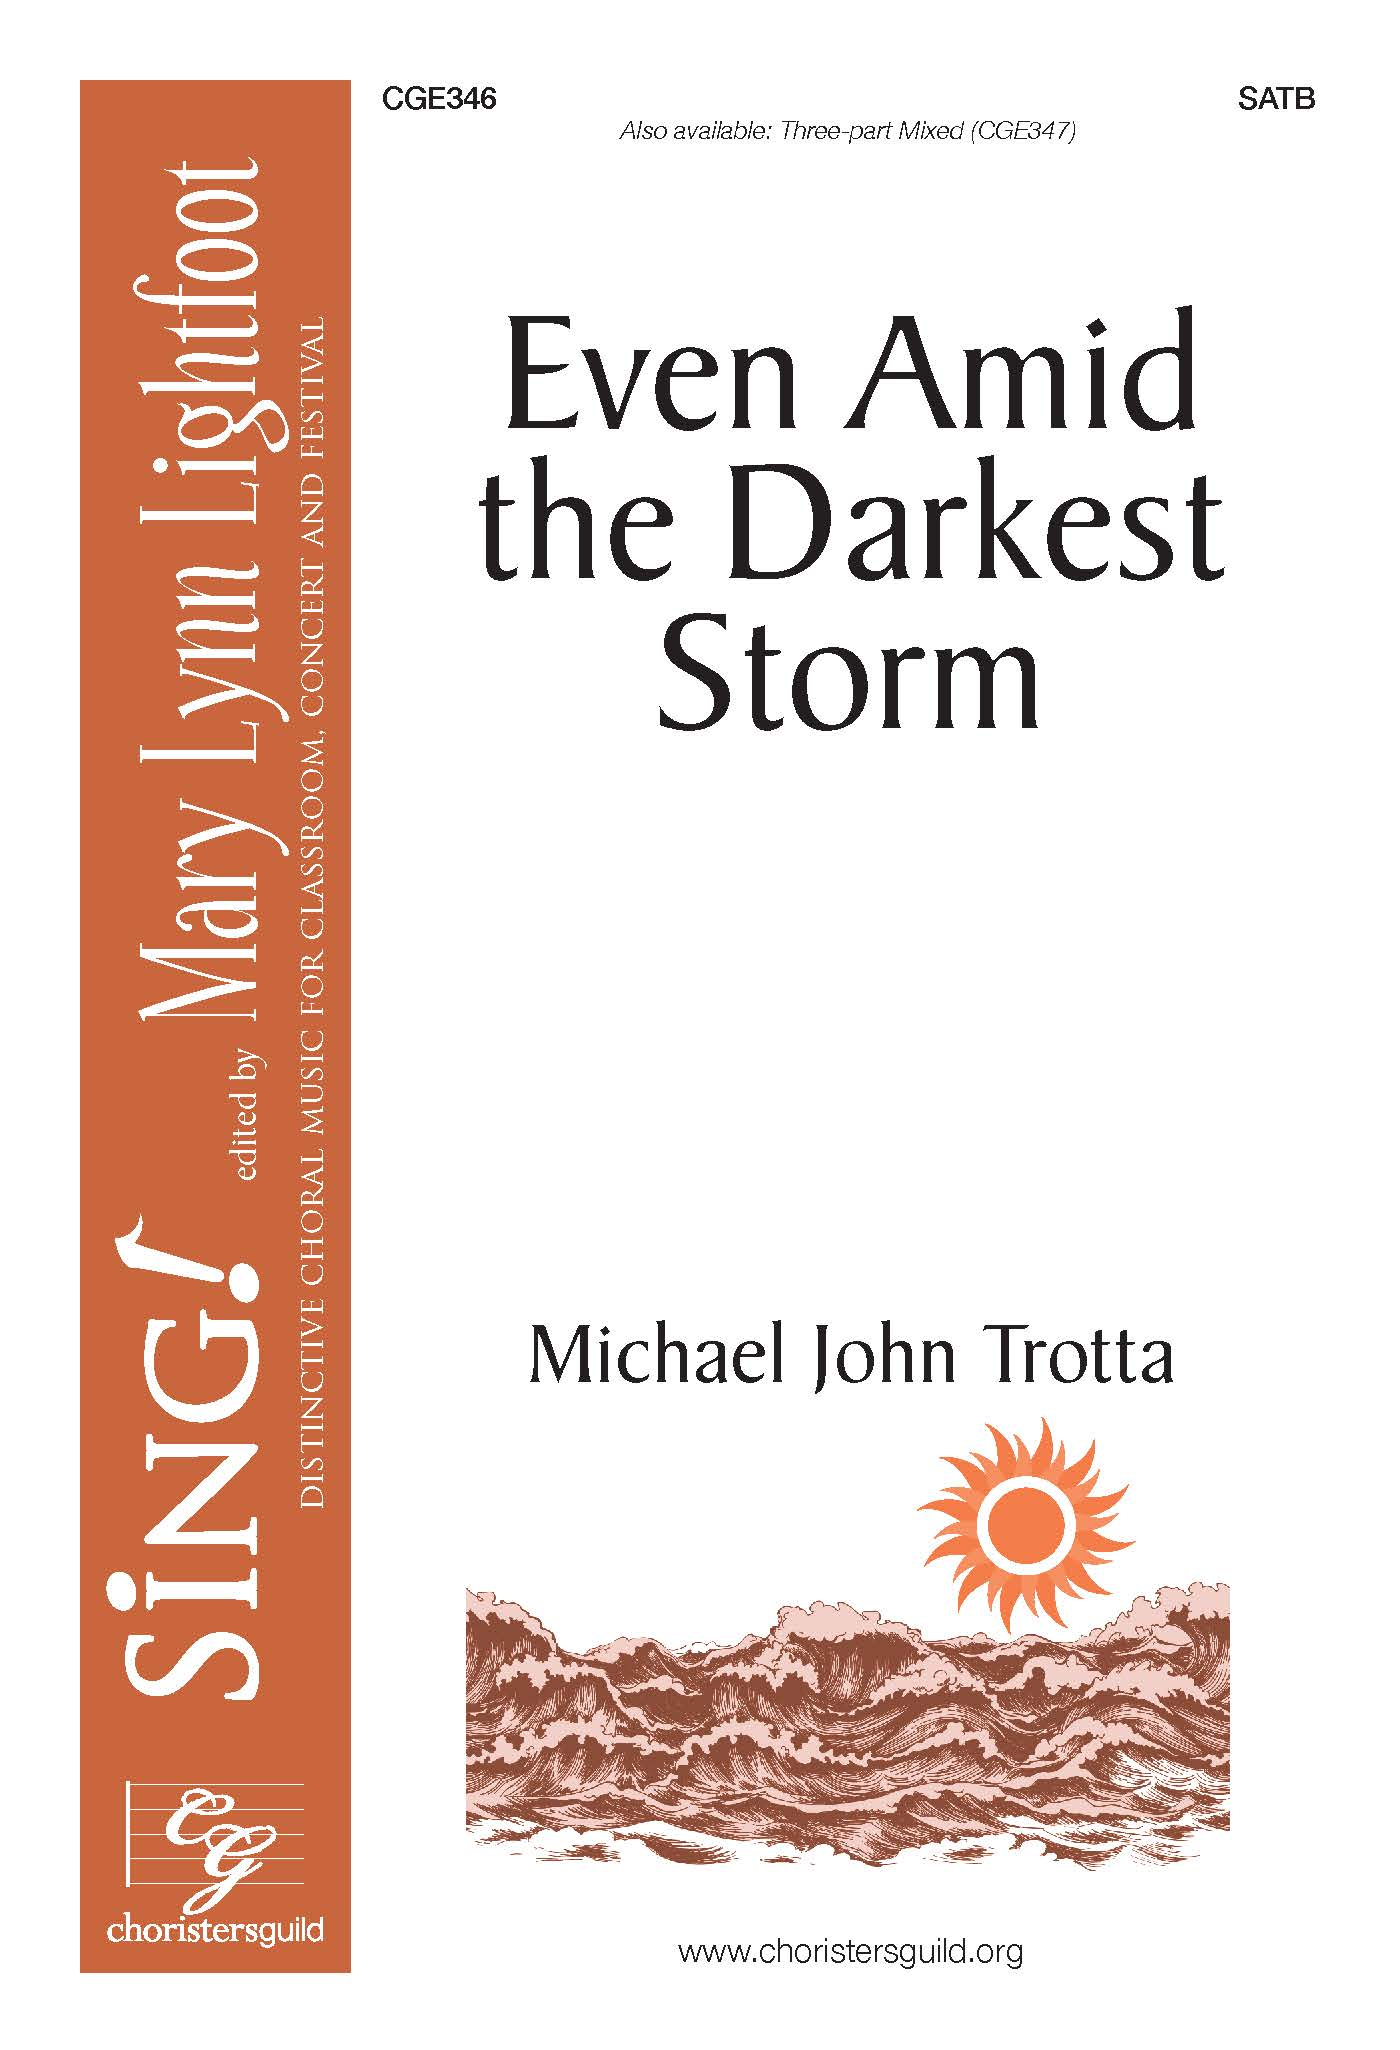 Even Amid the Darkest Storm - SATB